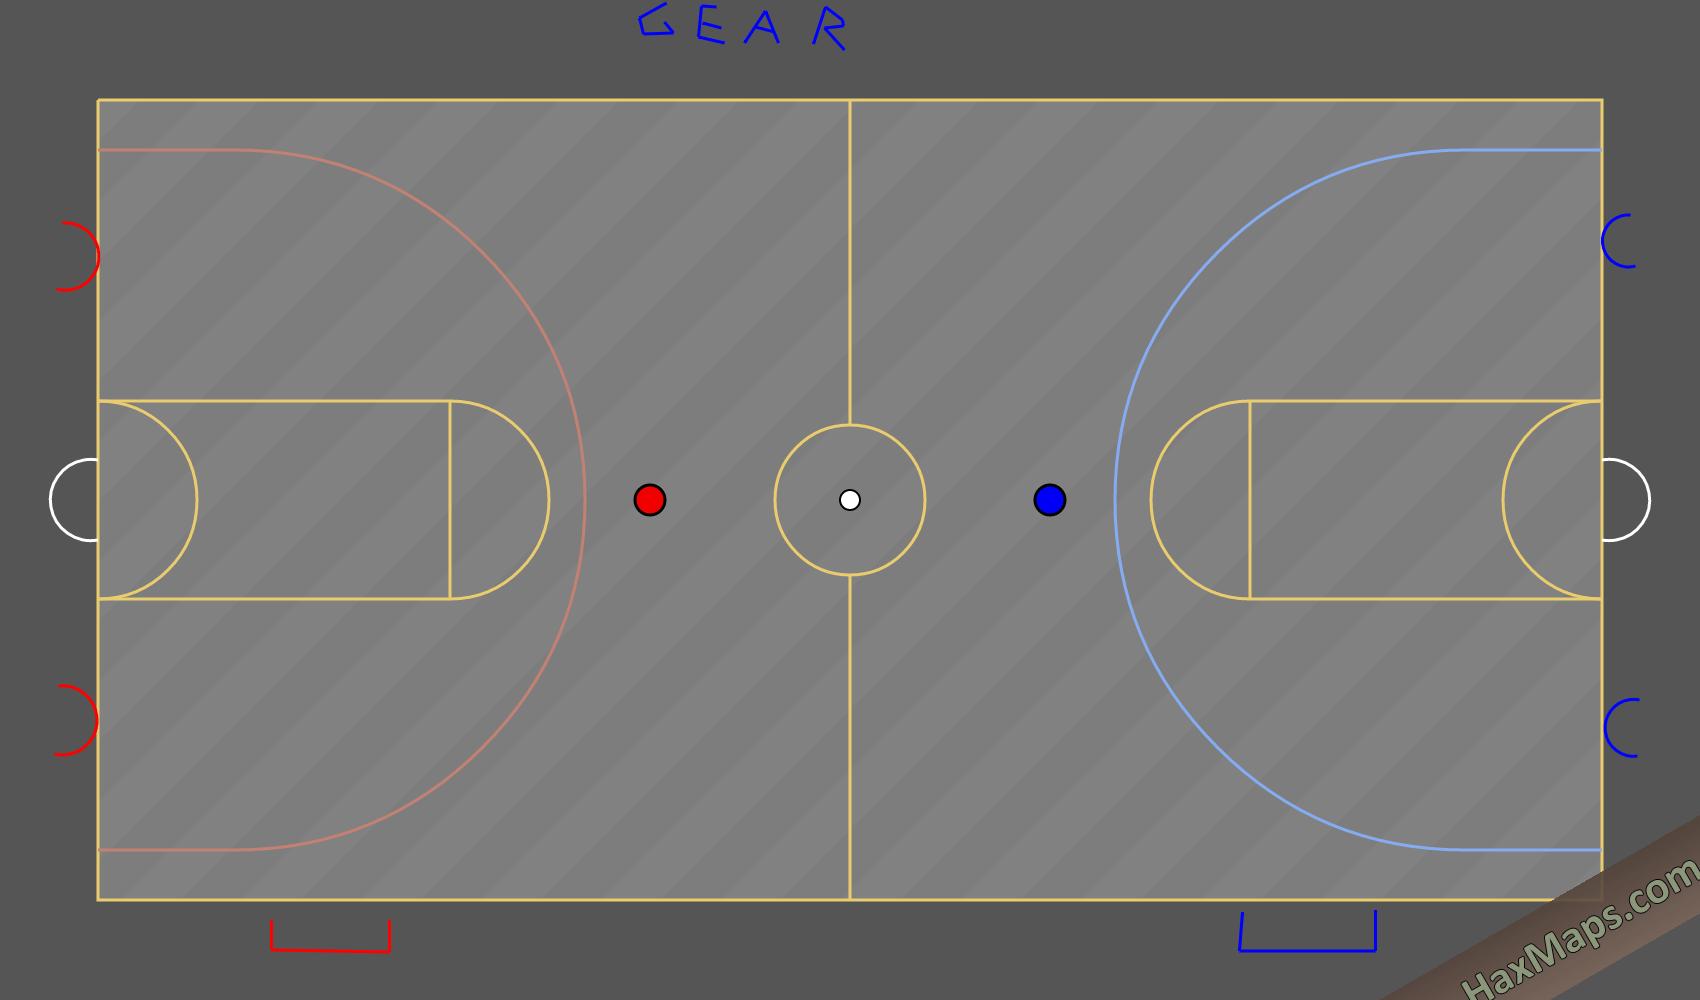 hax ball maps | Gear Basketball REAL